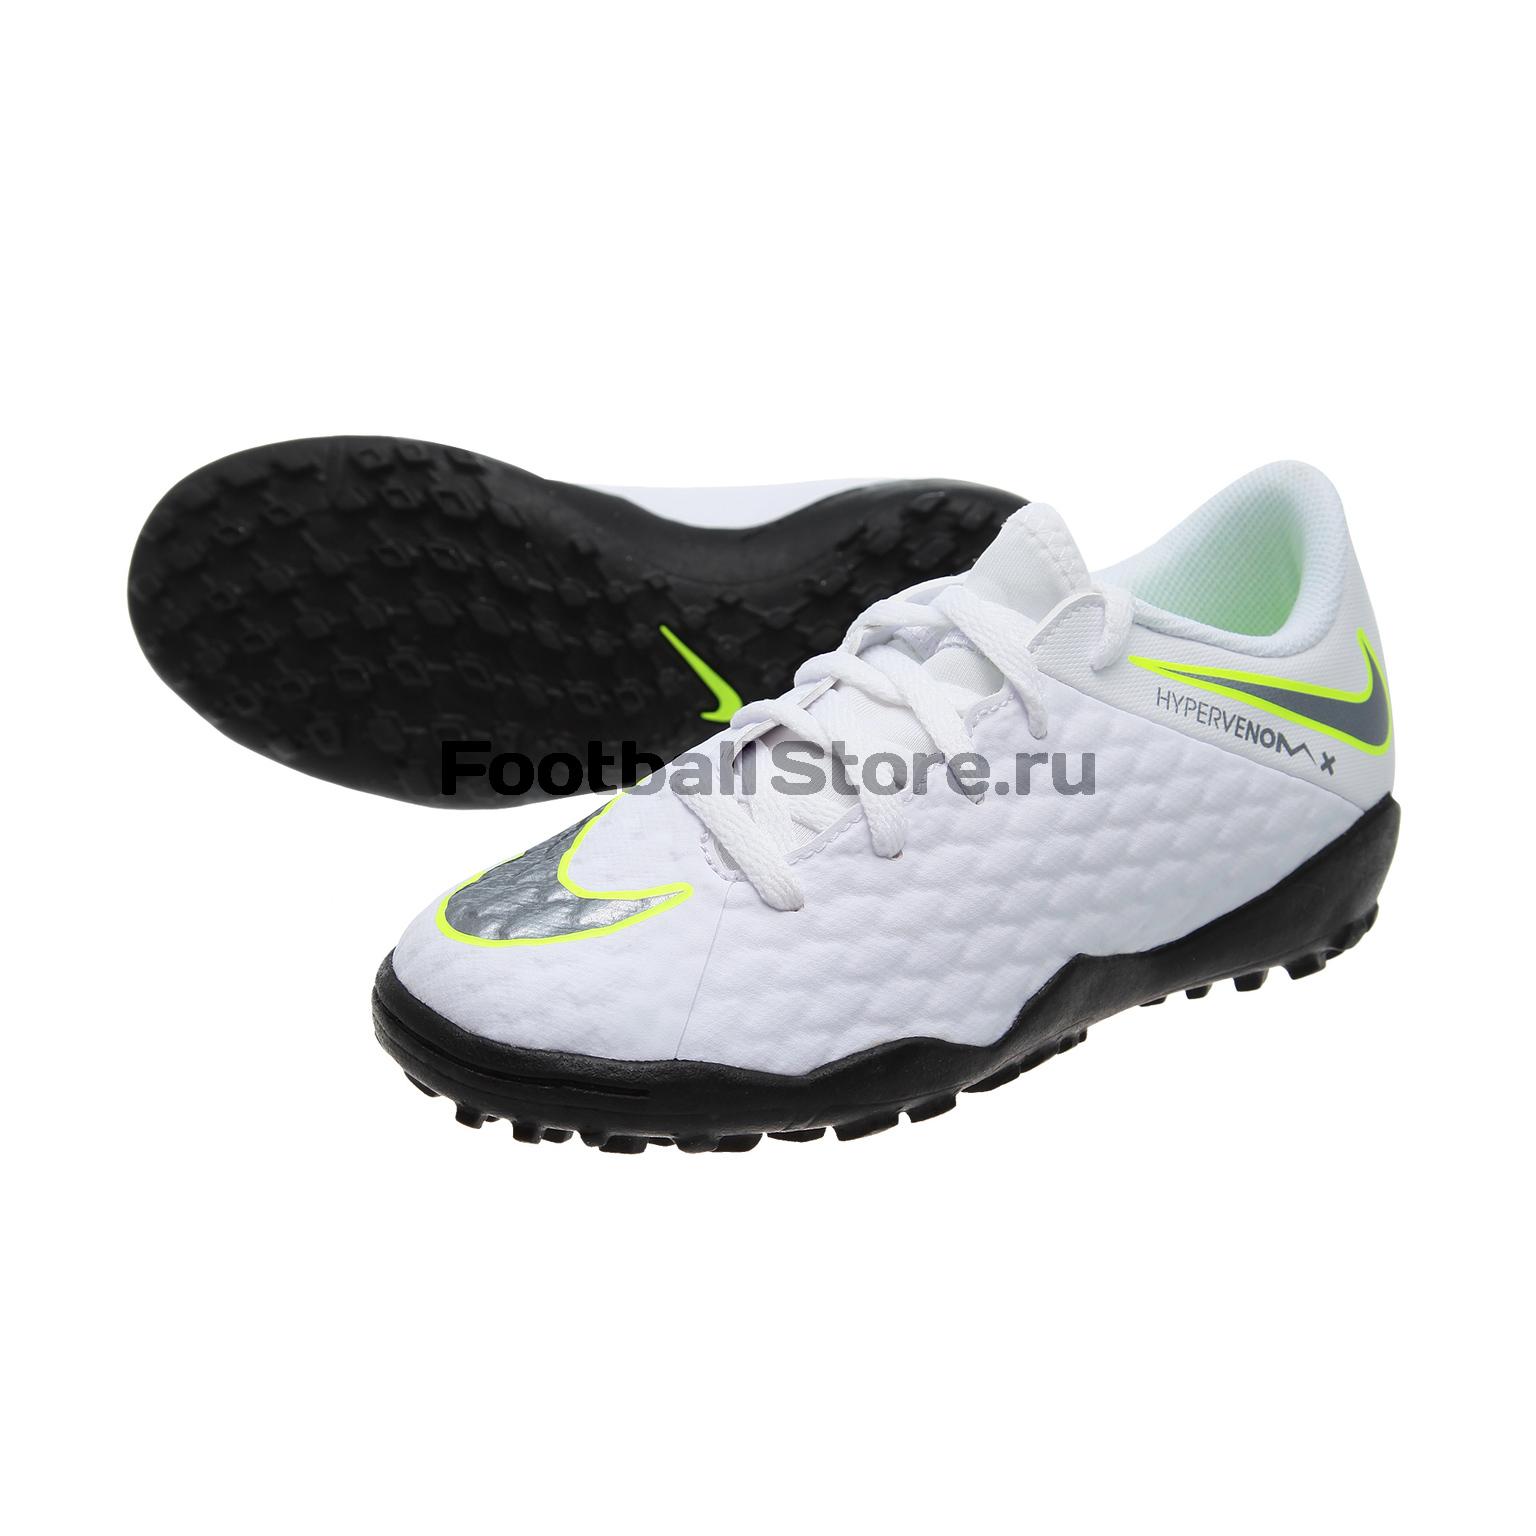 e01ba9aab35bf Шиповки Nike Hypervenom X 3 Academy TF AJ3815-001  Товары и цены ...